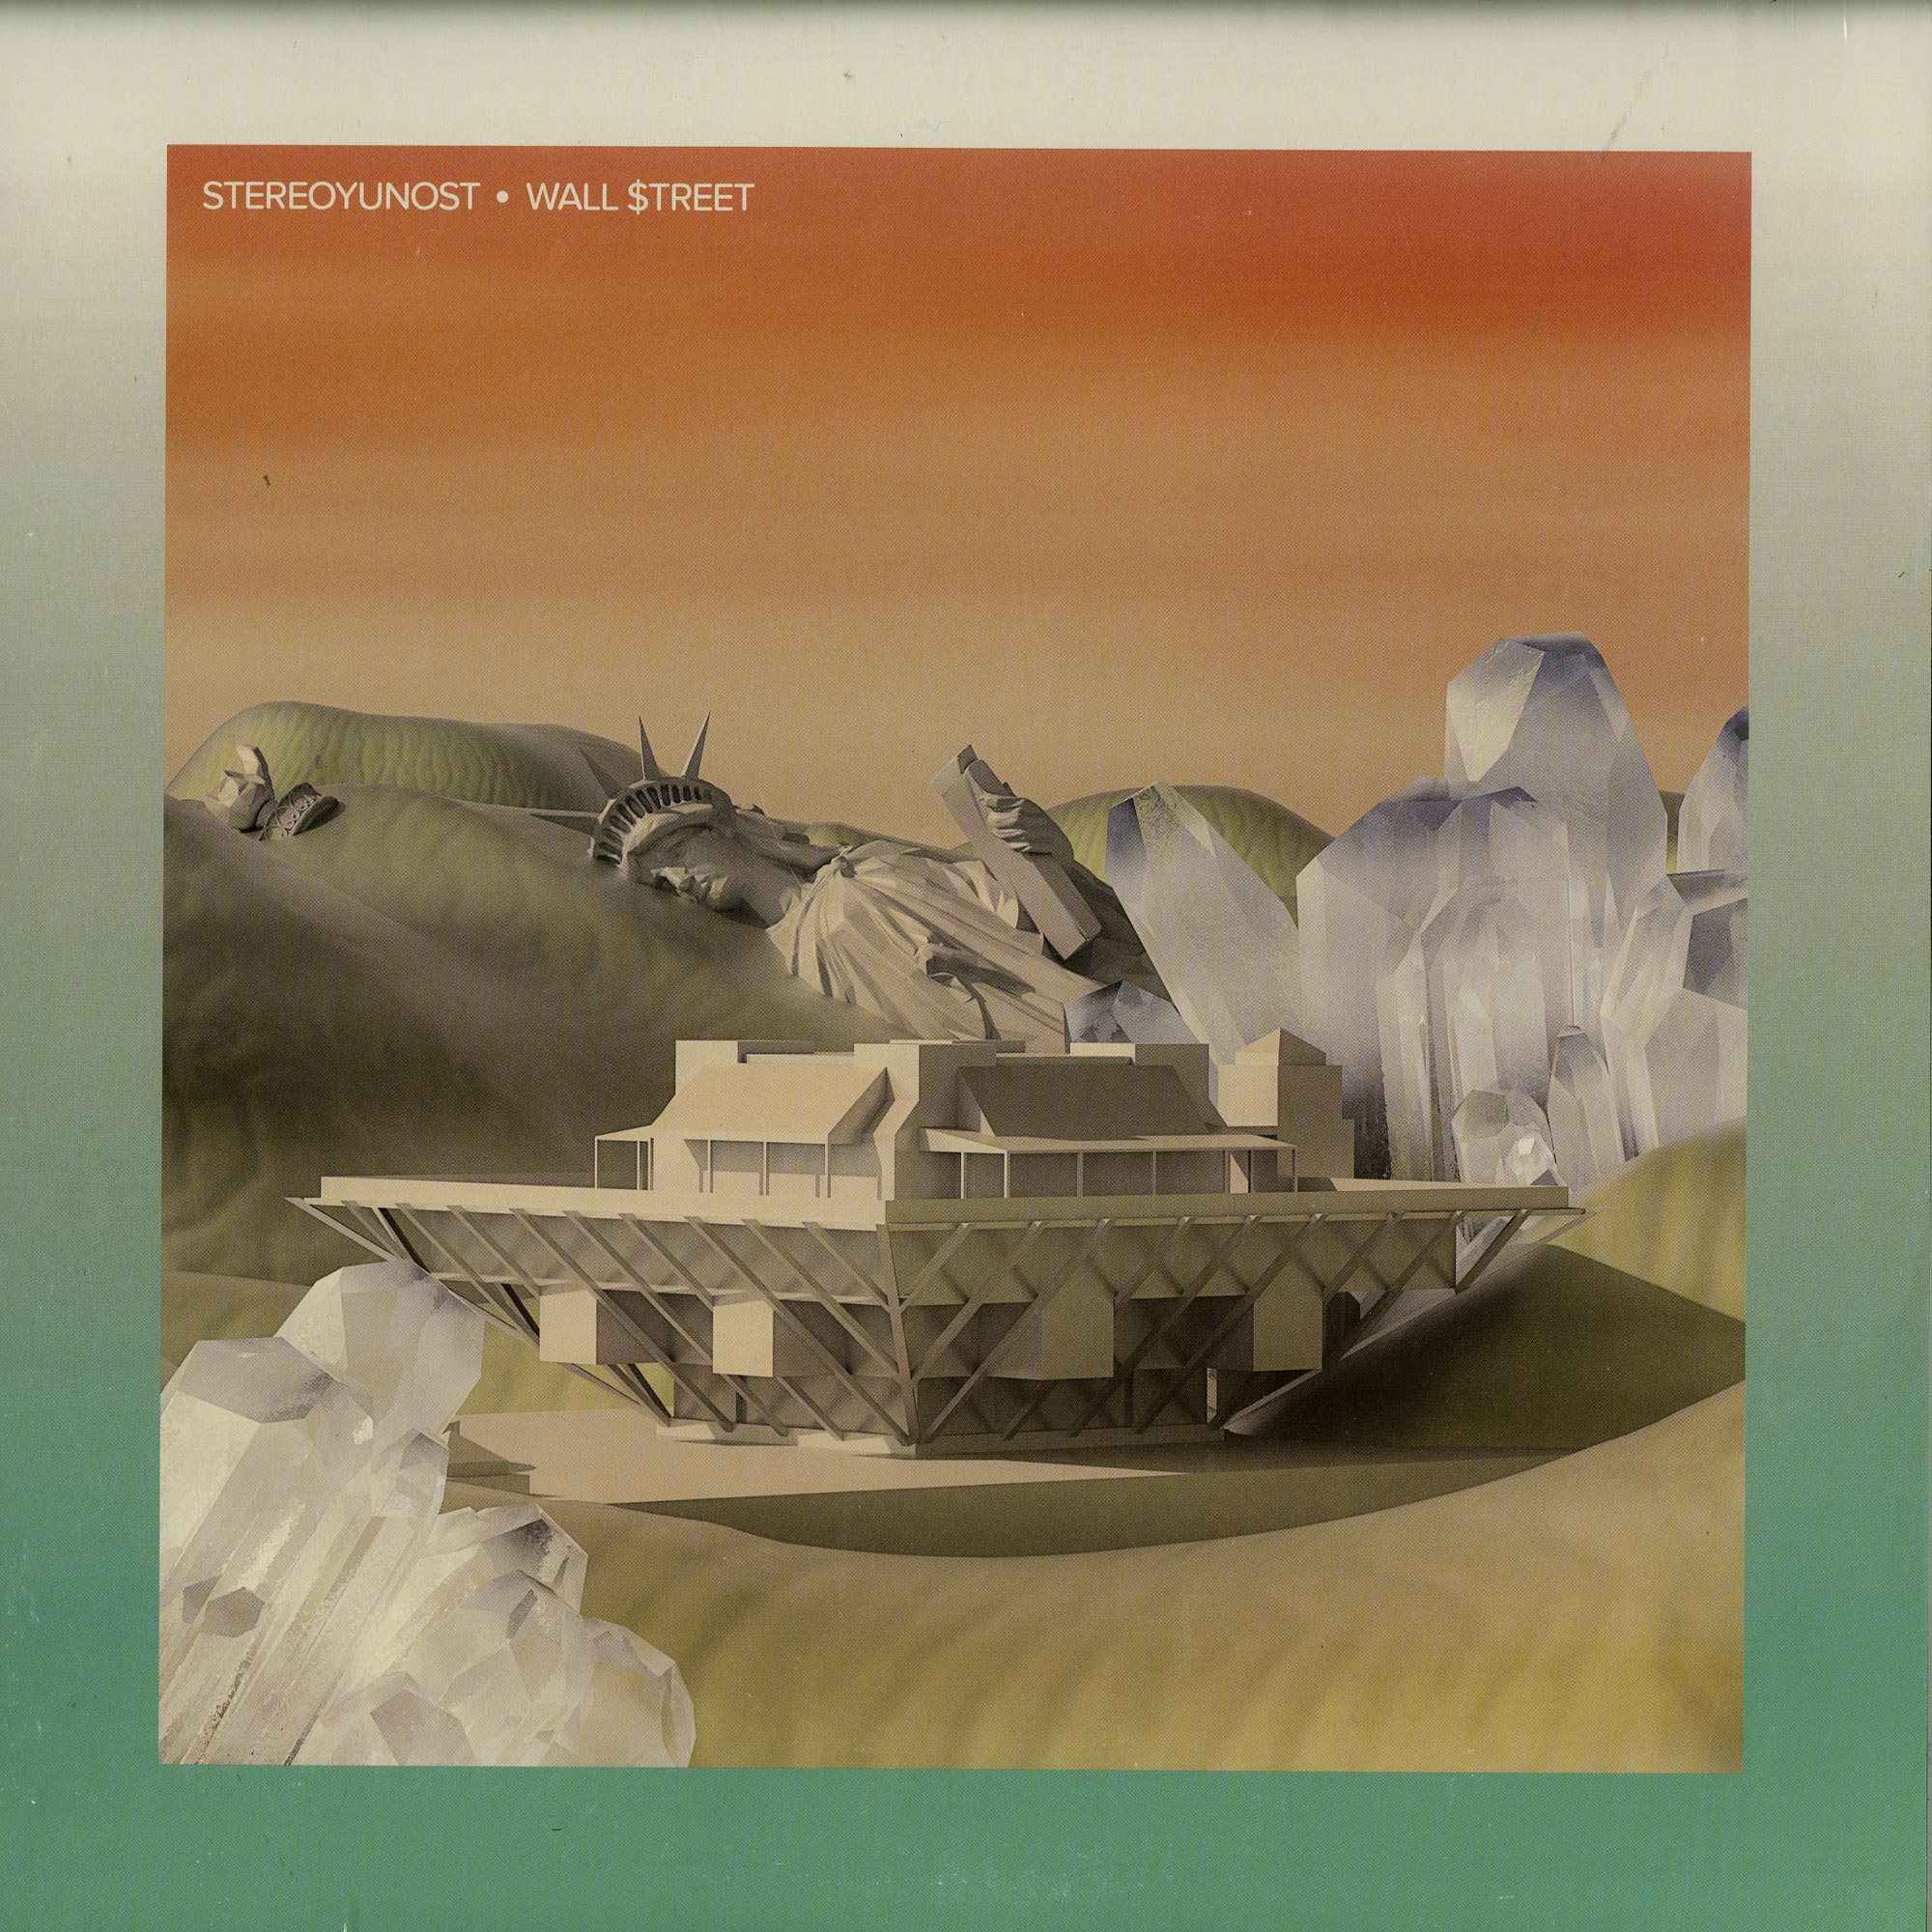 Stereoyunost / Wall $treet - SPLIT EP